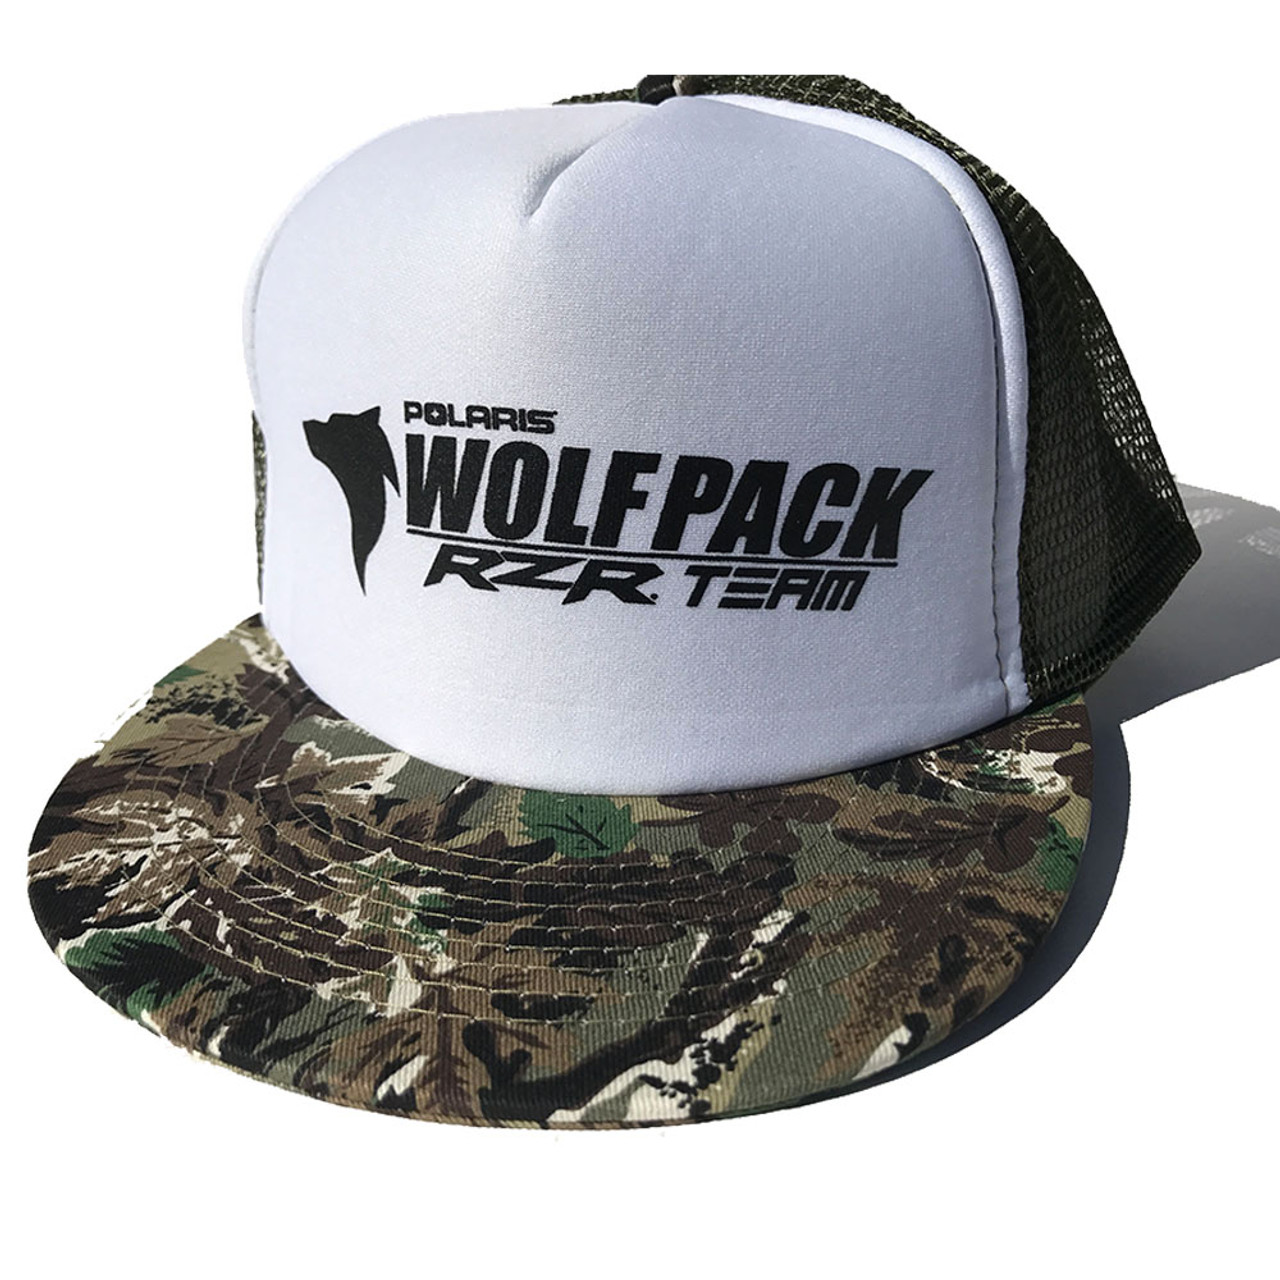 UTV Wolfpack Camo Hat White with Black Logo Snapback - WOLFPACK PARTS 29690cc11bb